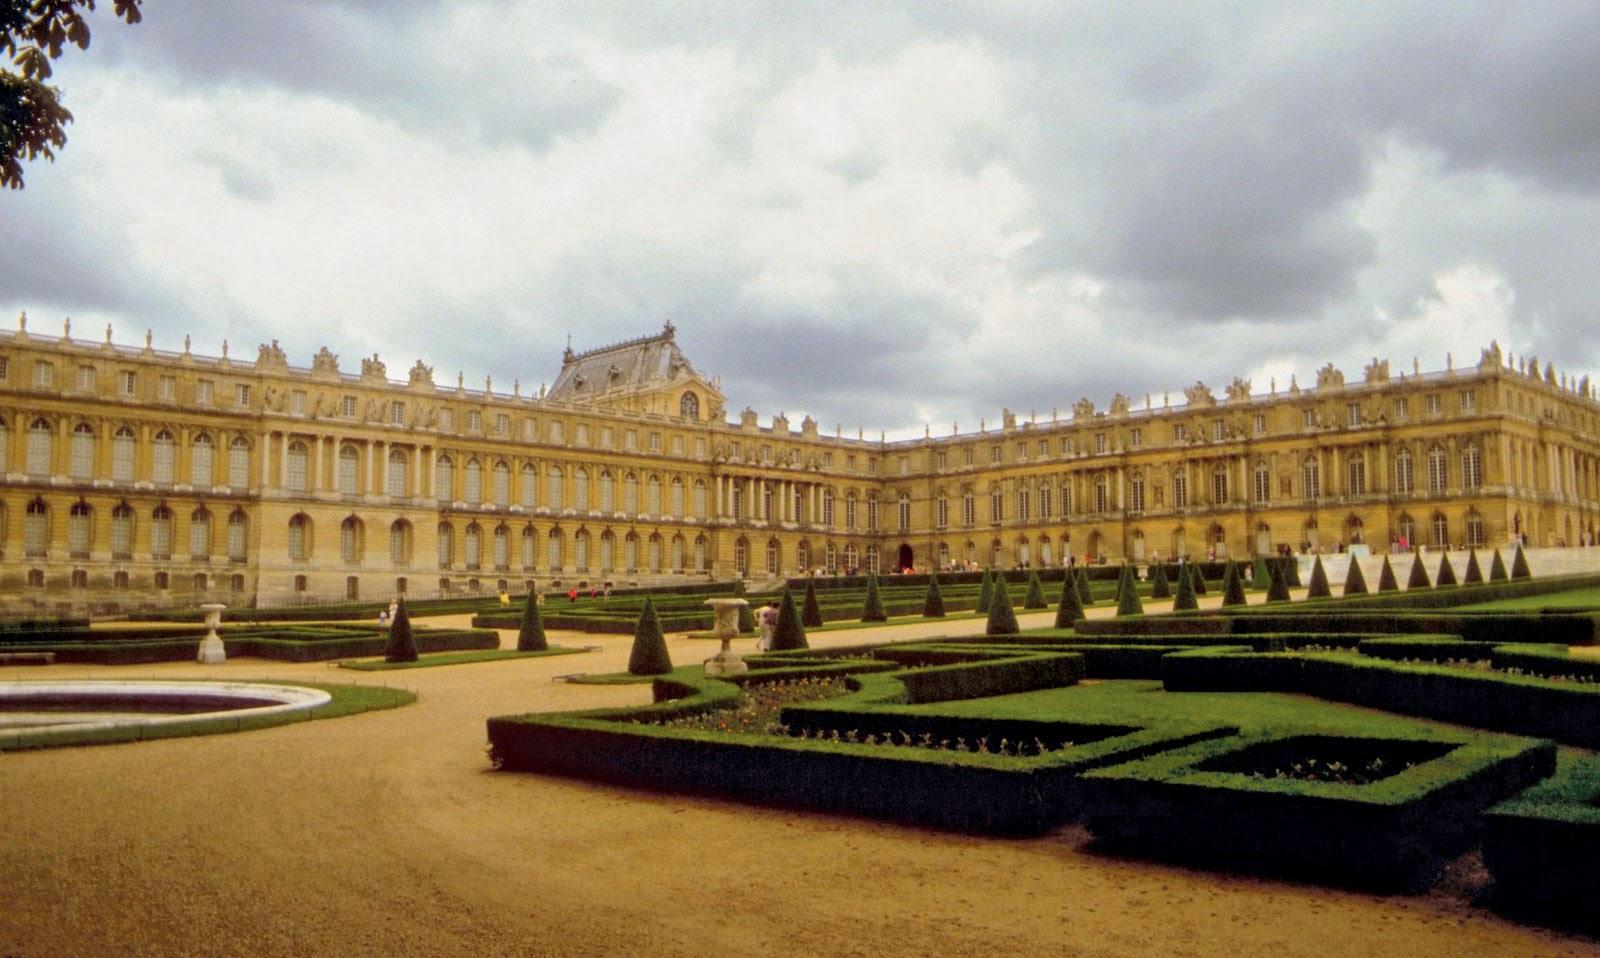 Palace of Versailles - Tourist Destinations